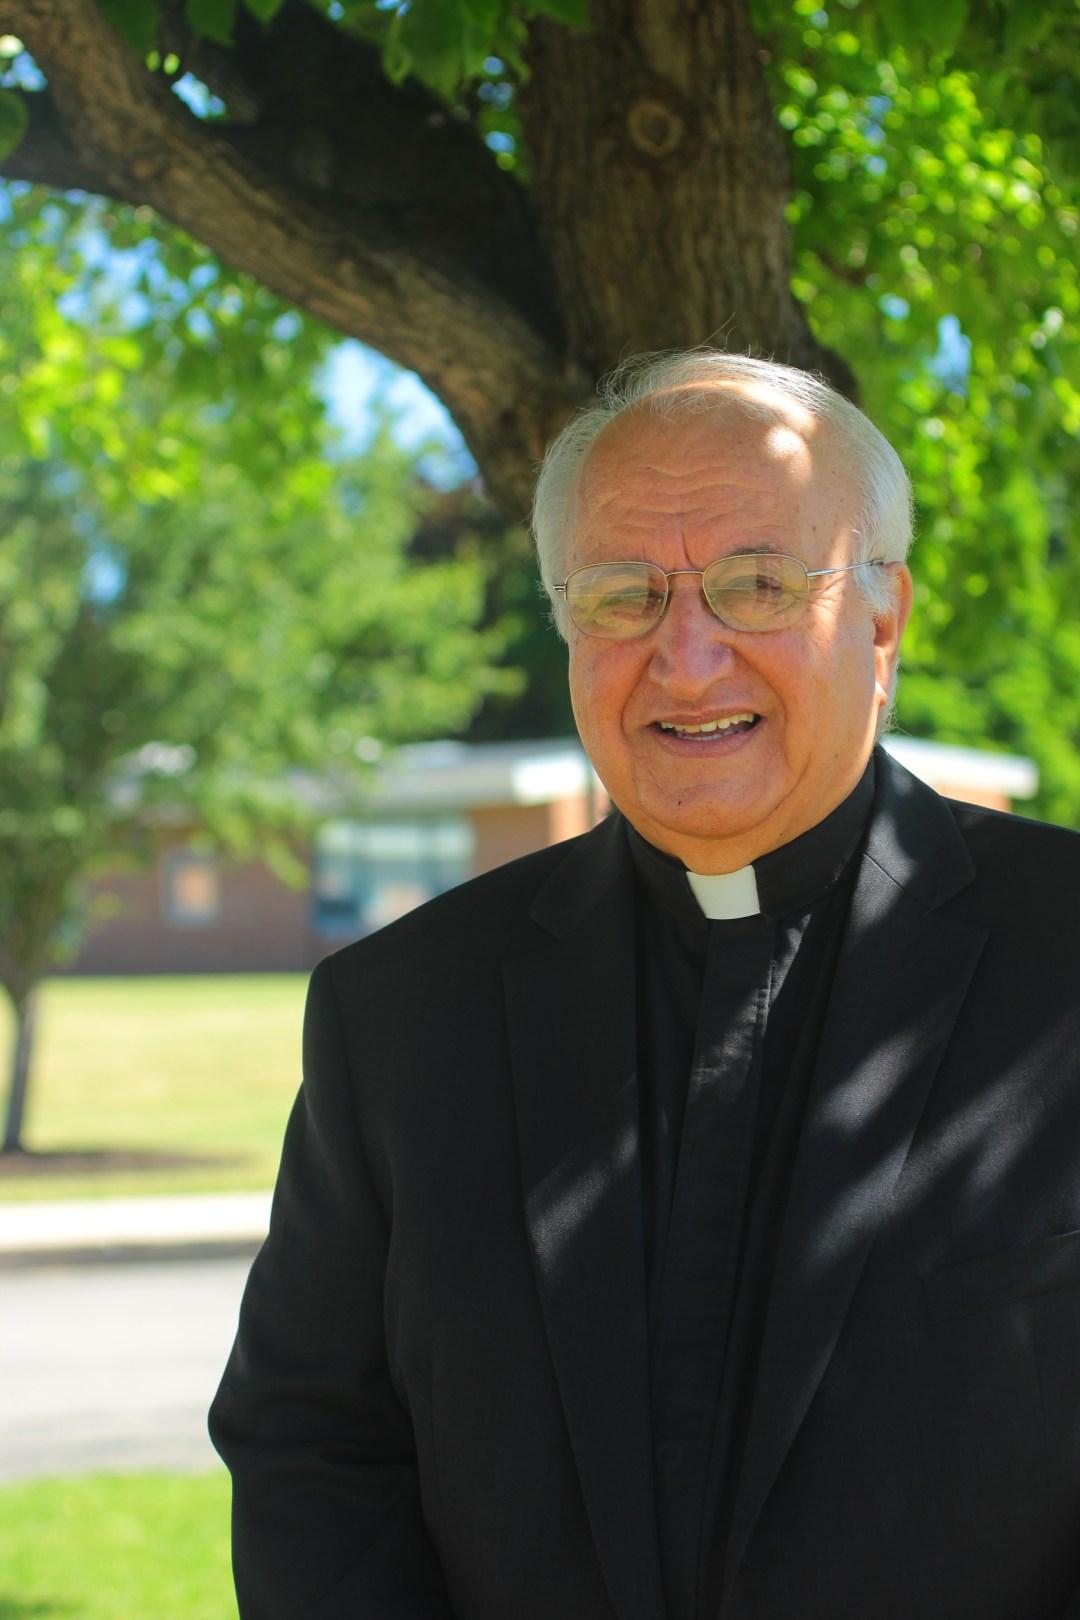 Rev. Michael Farano